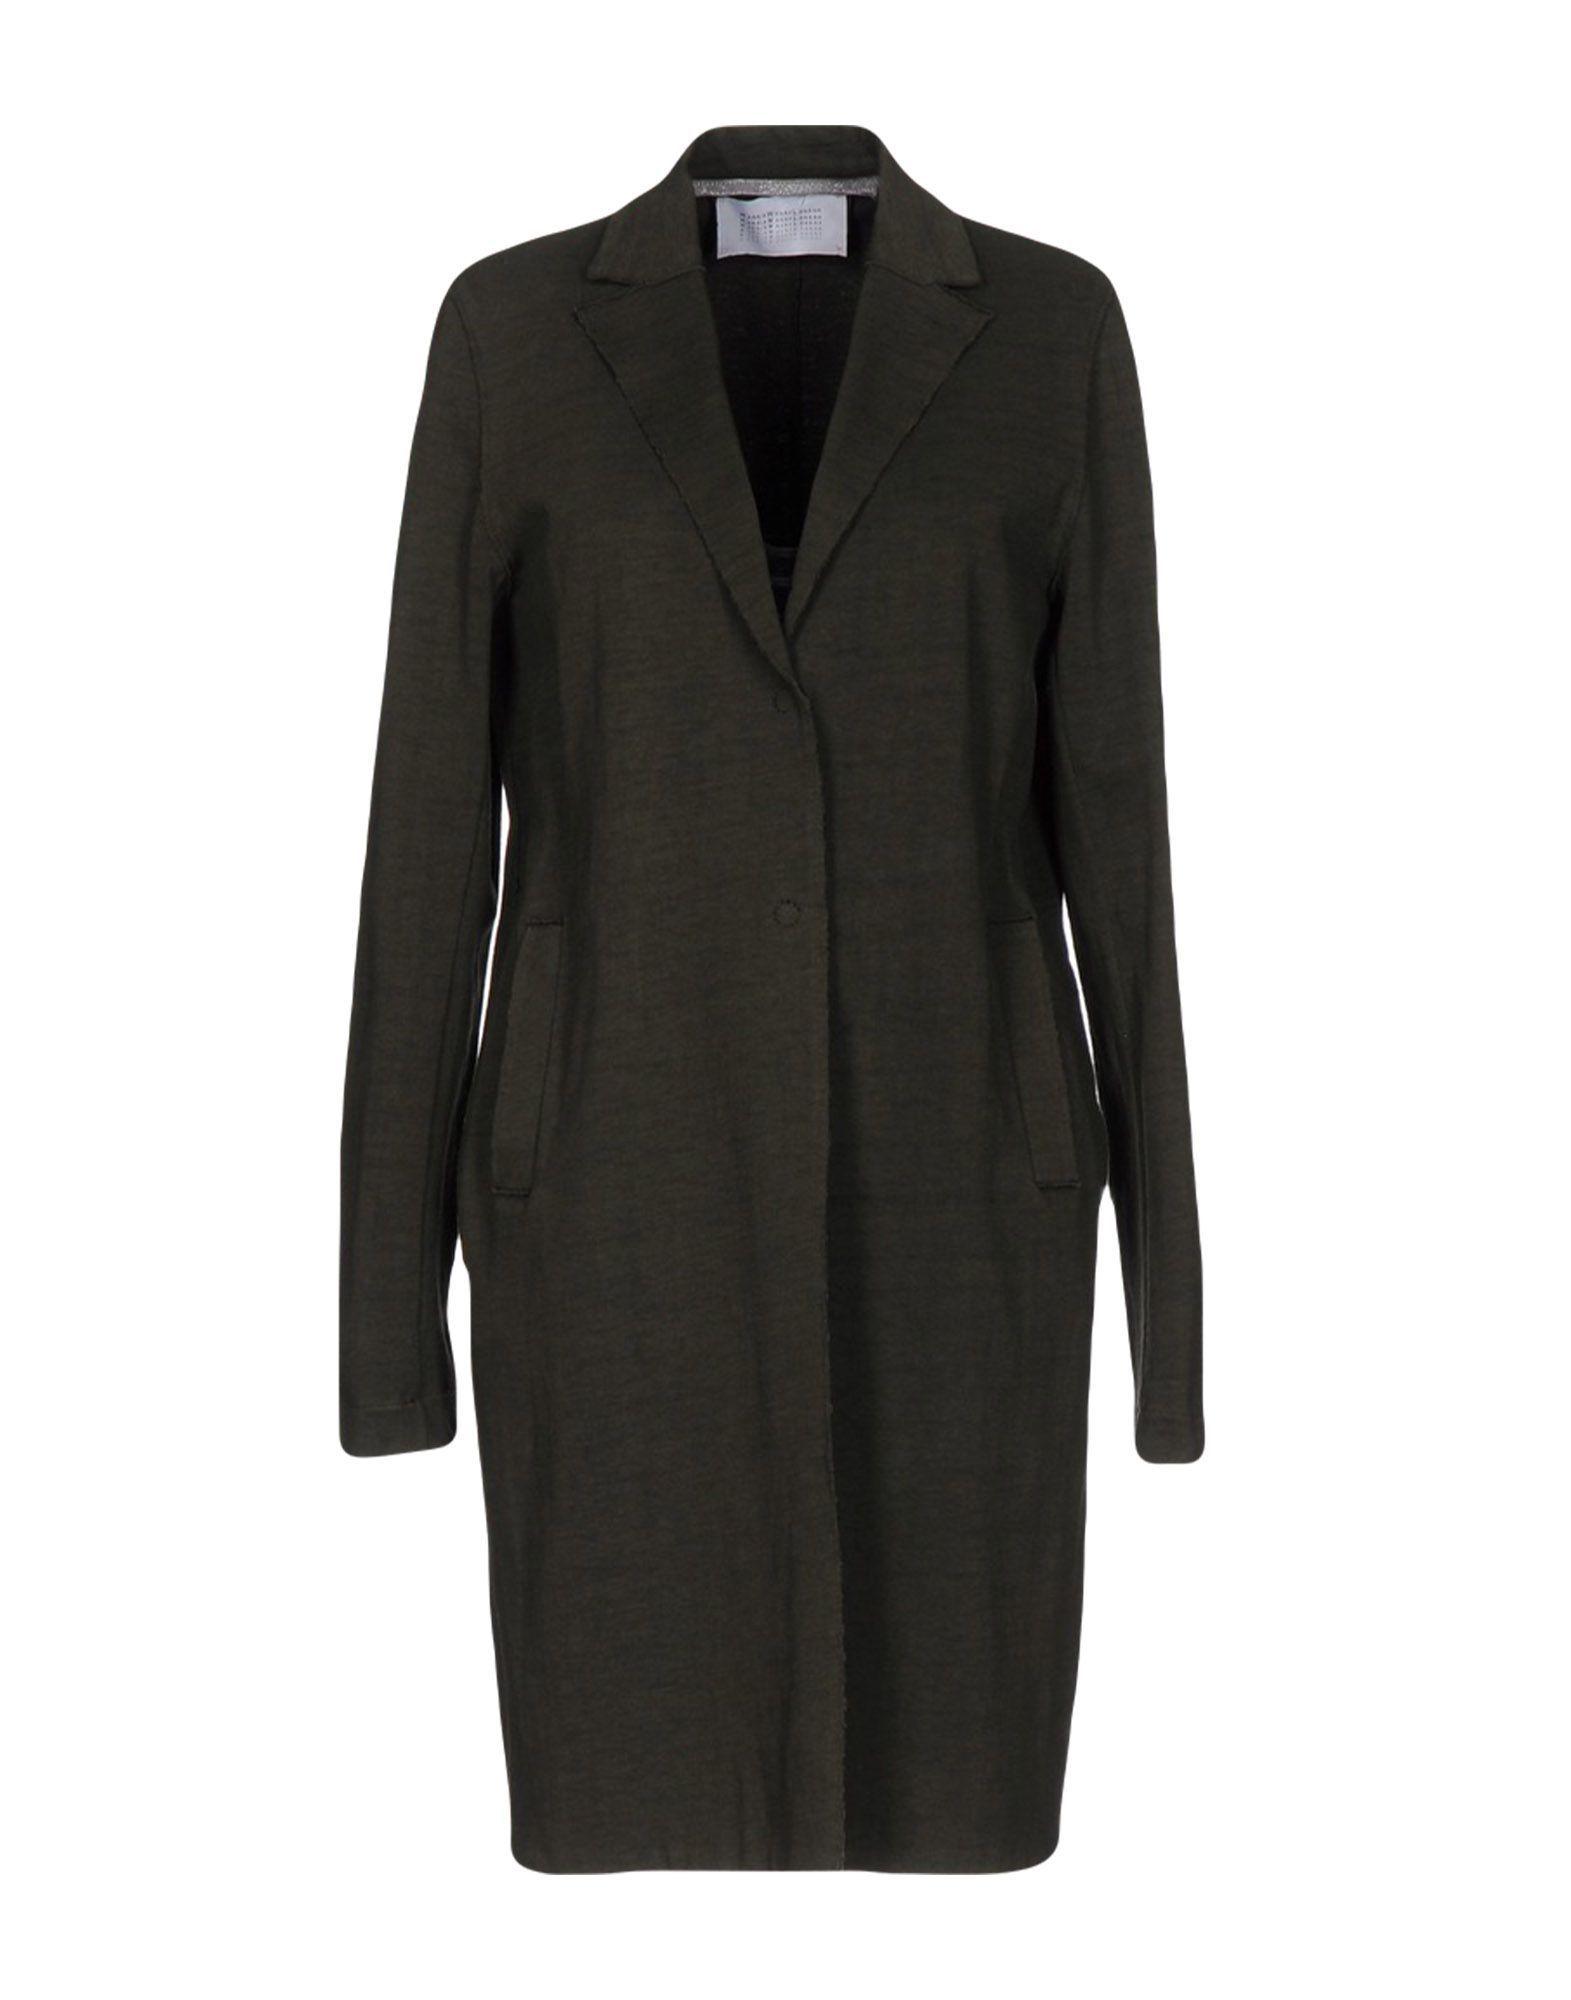 Harris Wharf London Military Green Cotton Coat